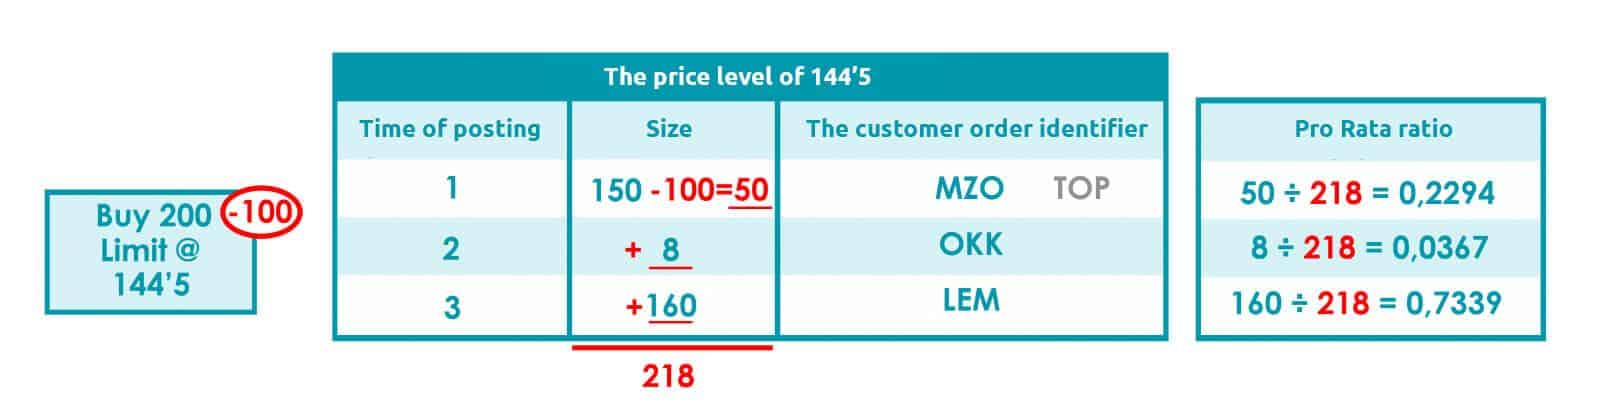 The price level of 144'5